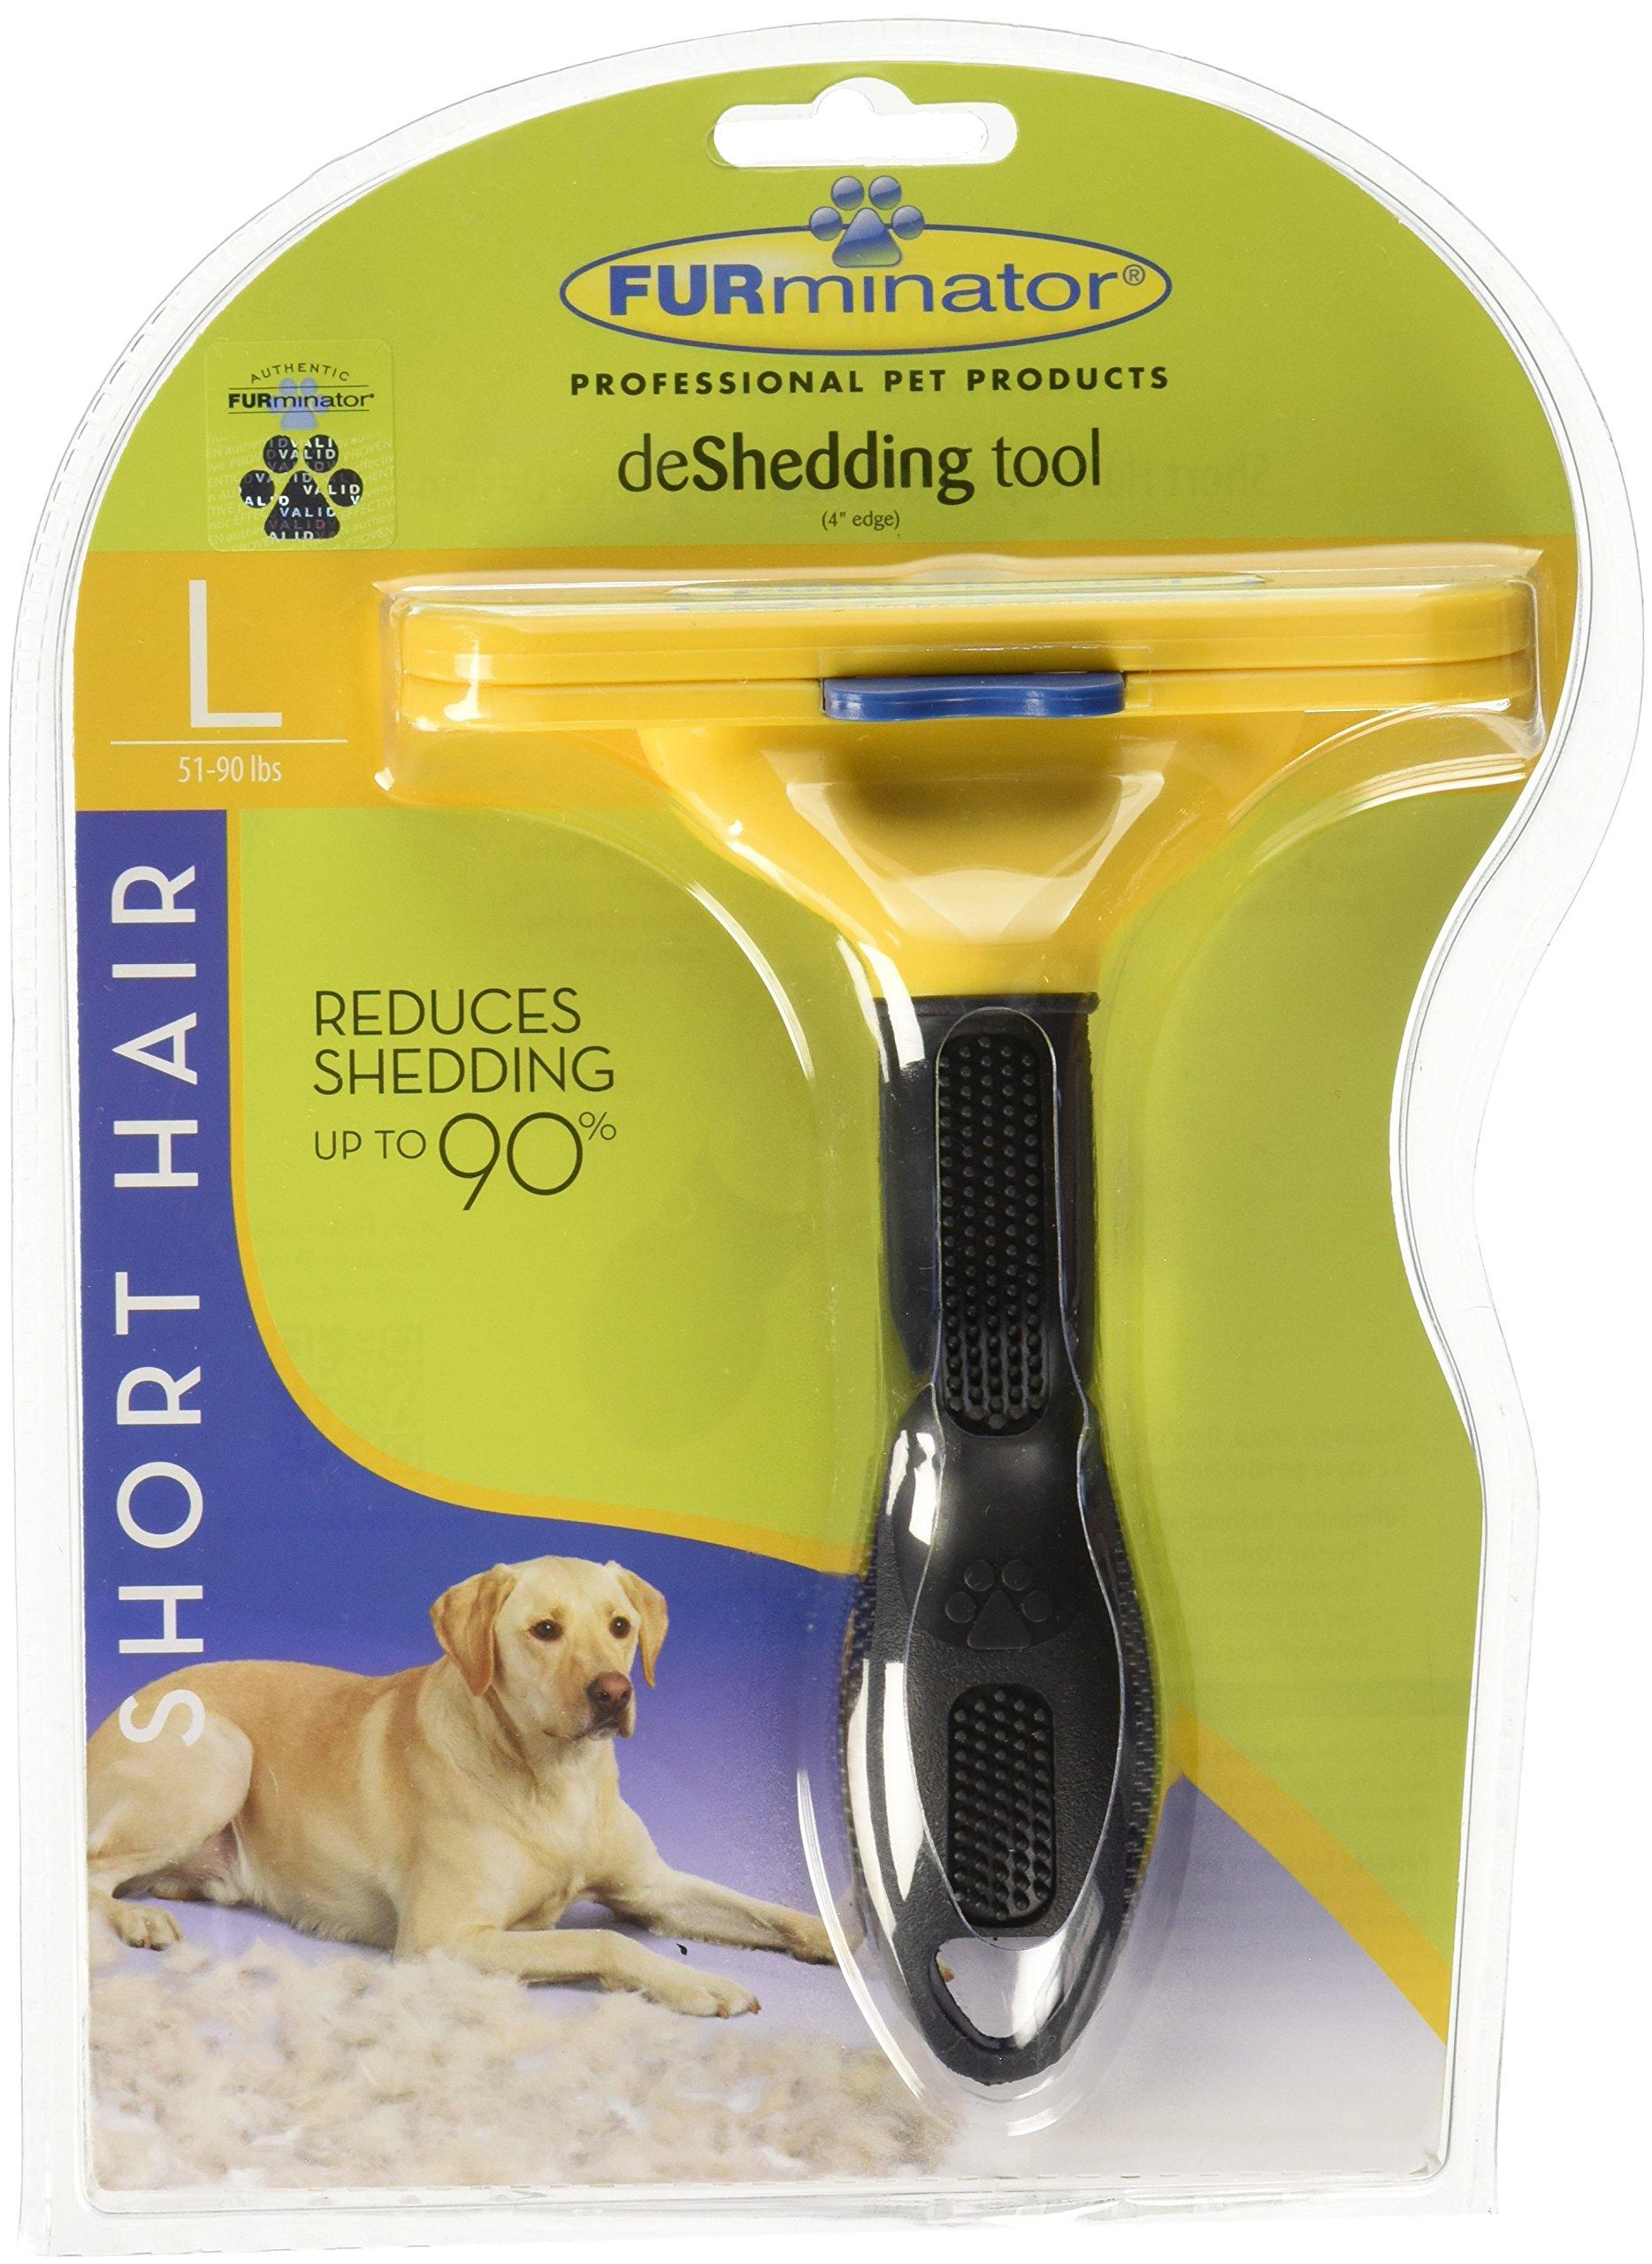 Furminator Shorthair deShedding Tool for Large Dogs